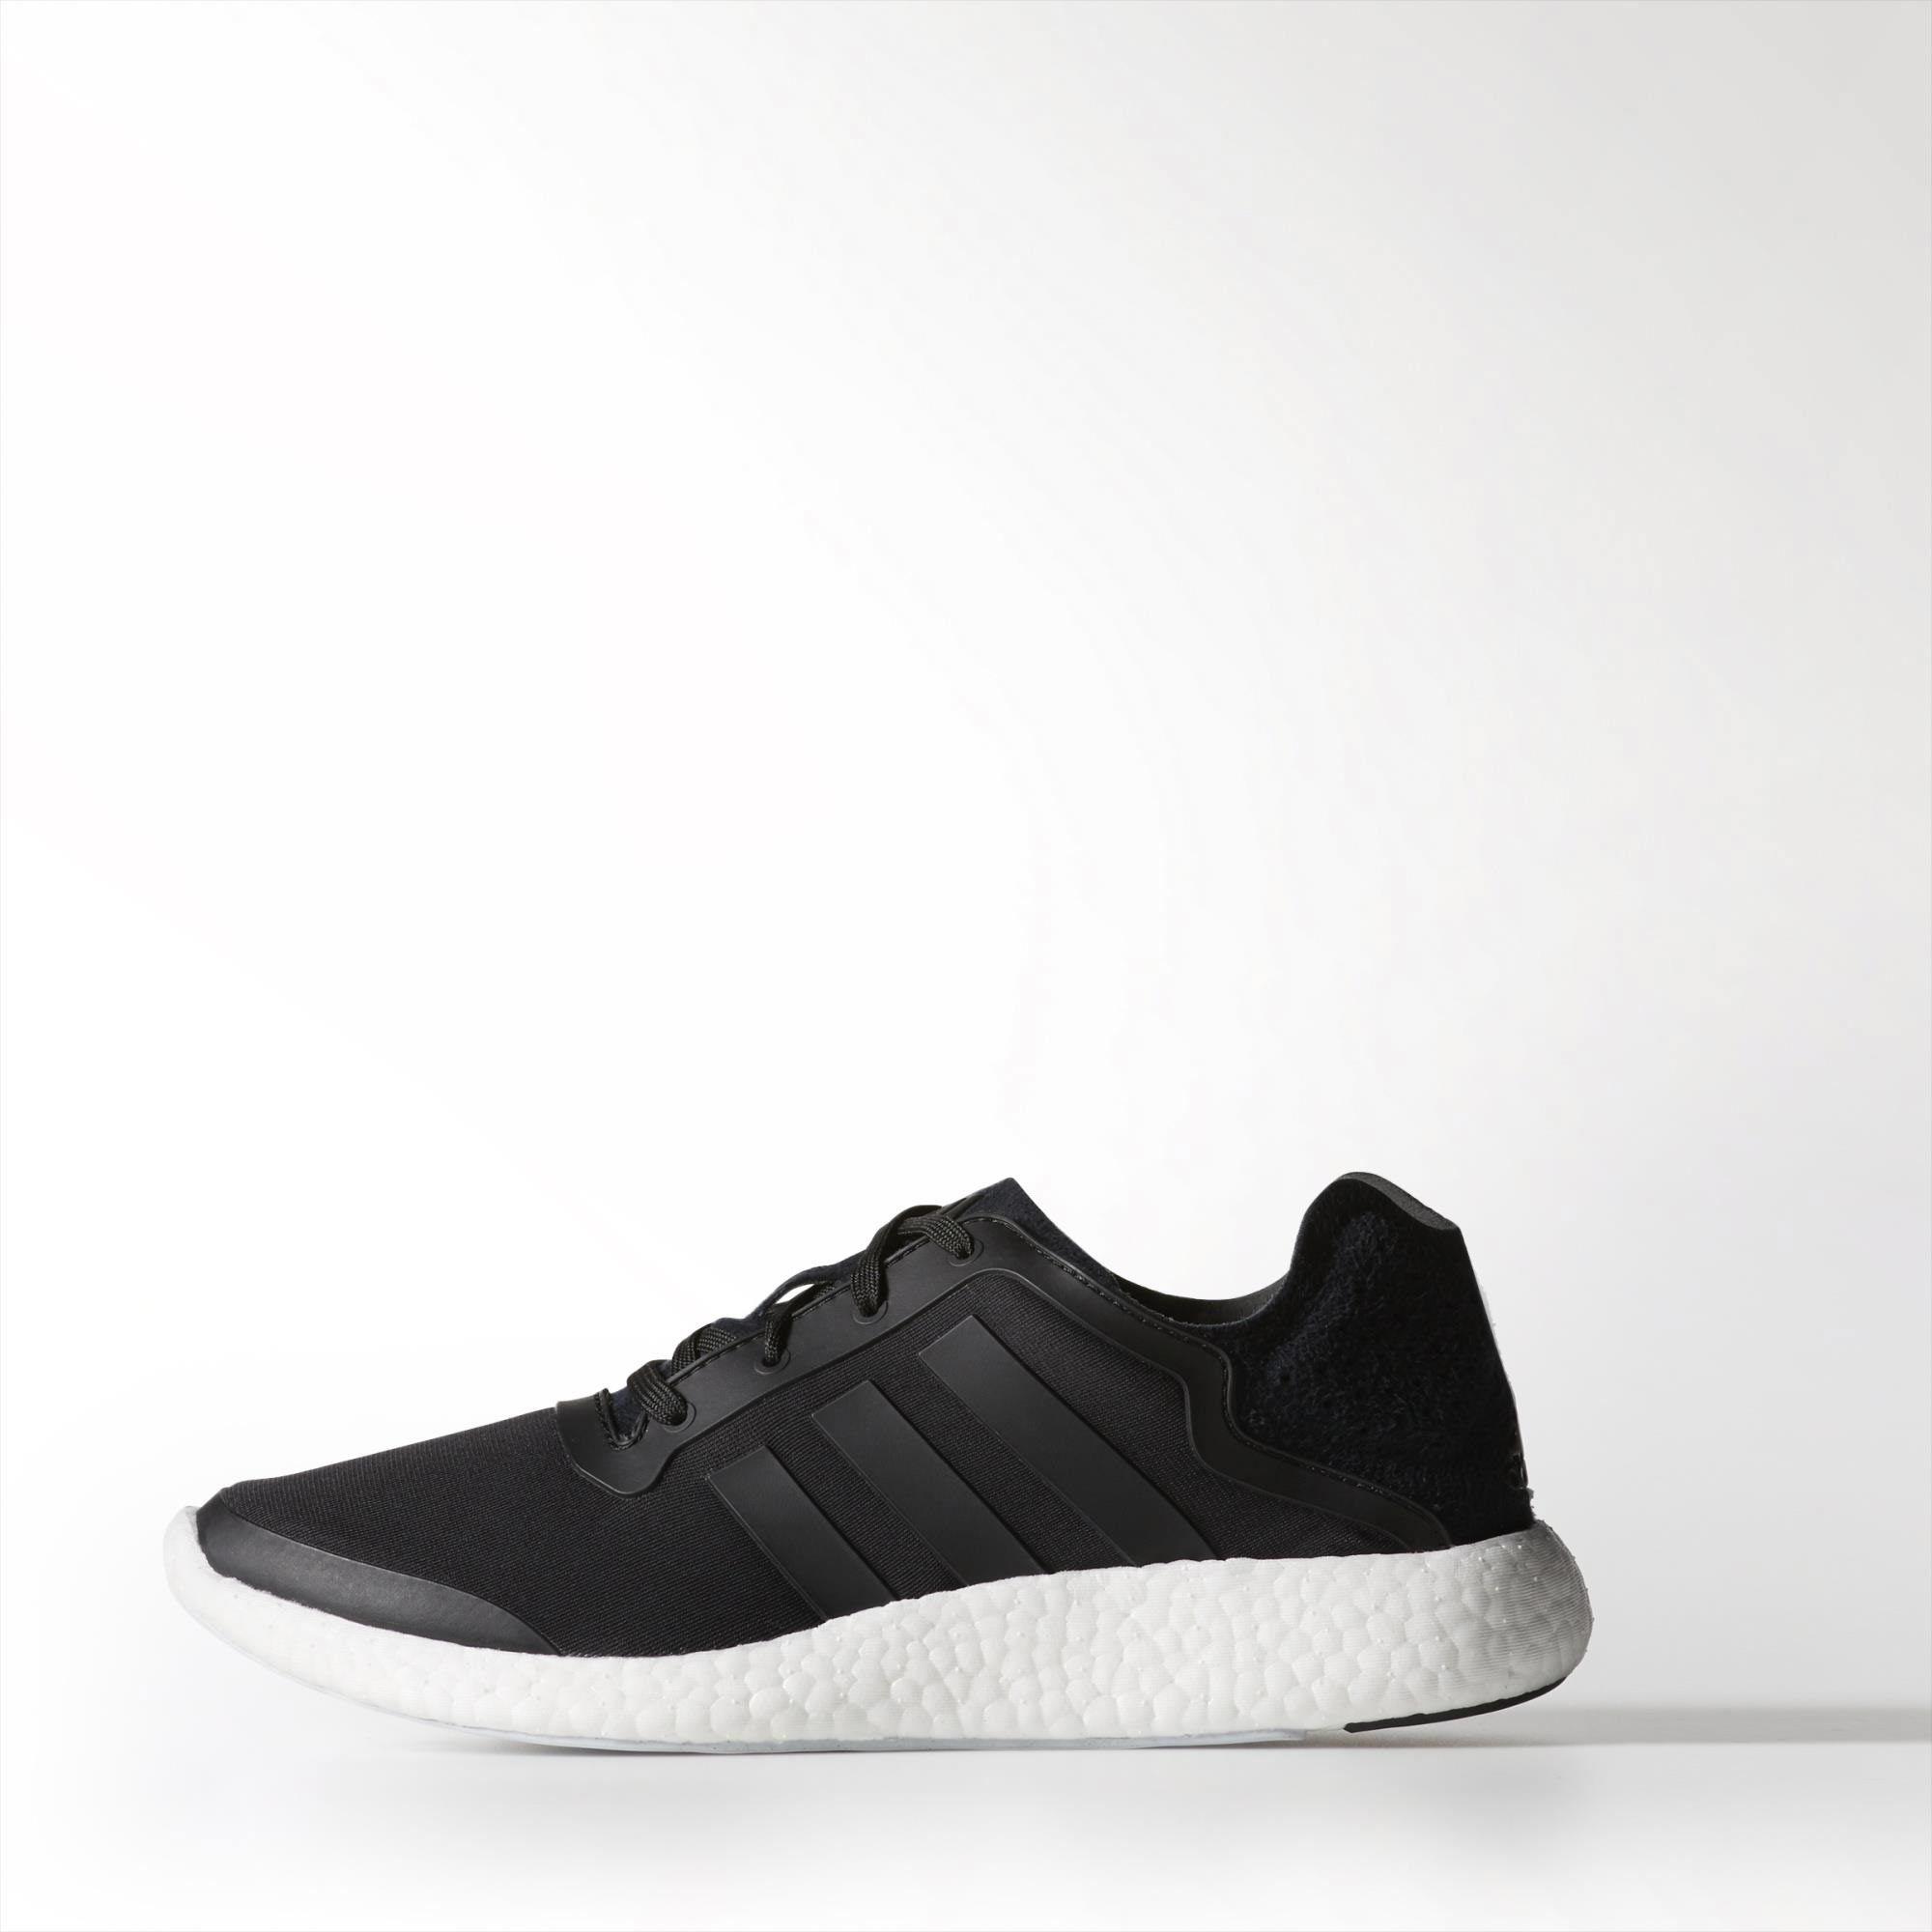 Adidas uomini impulso scarpe adidas canada moda / puro stile